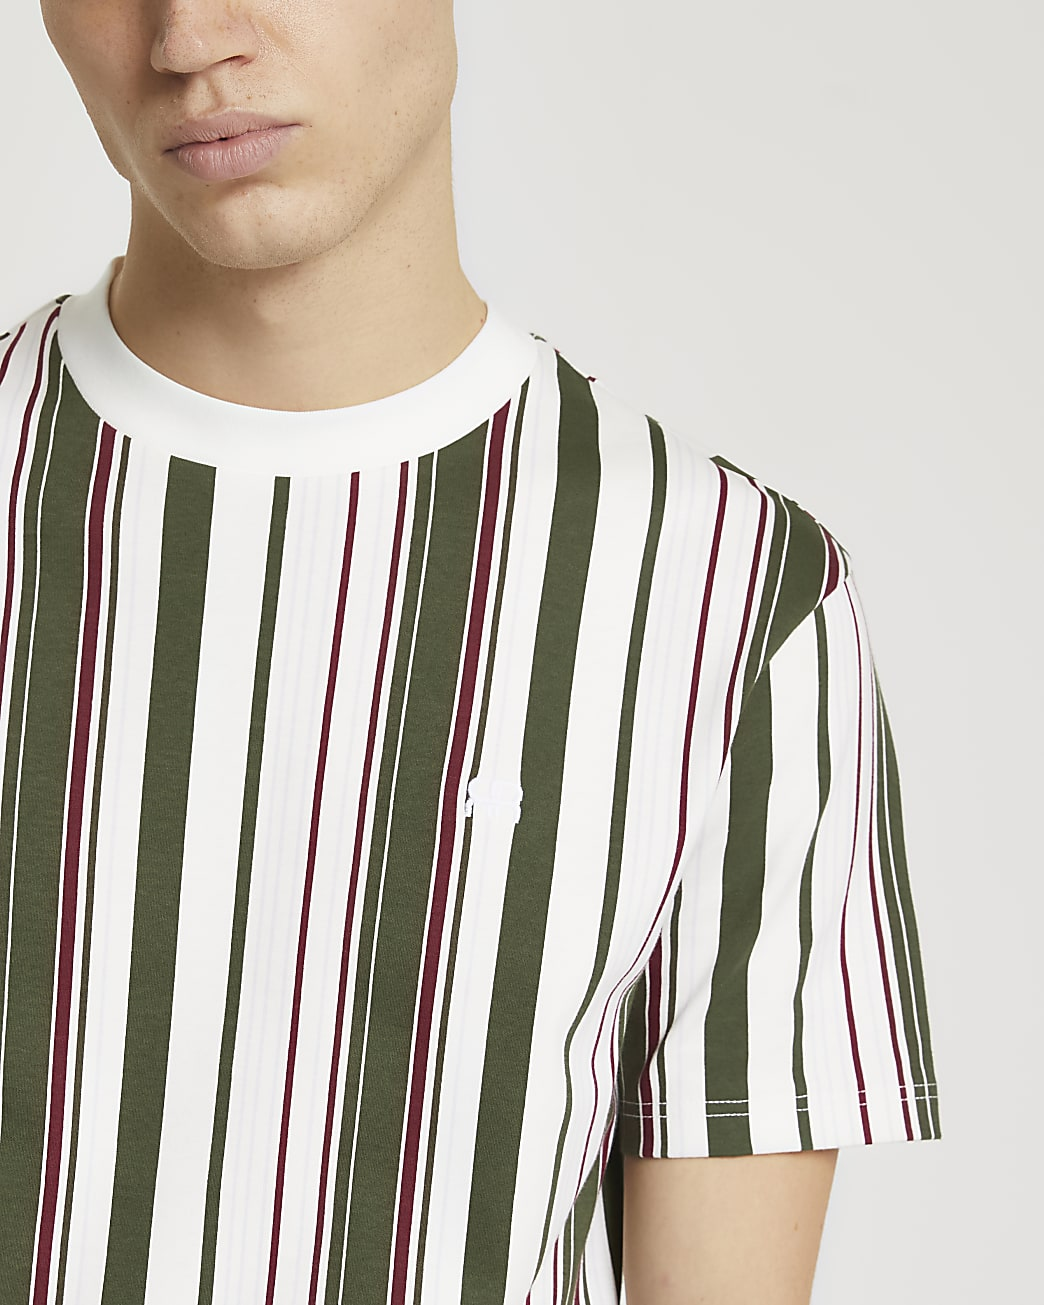 Khaki 'RR' stripe slim fit t-shirt